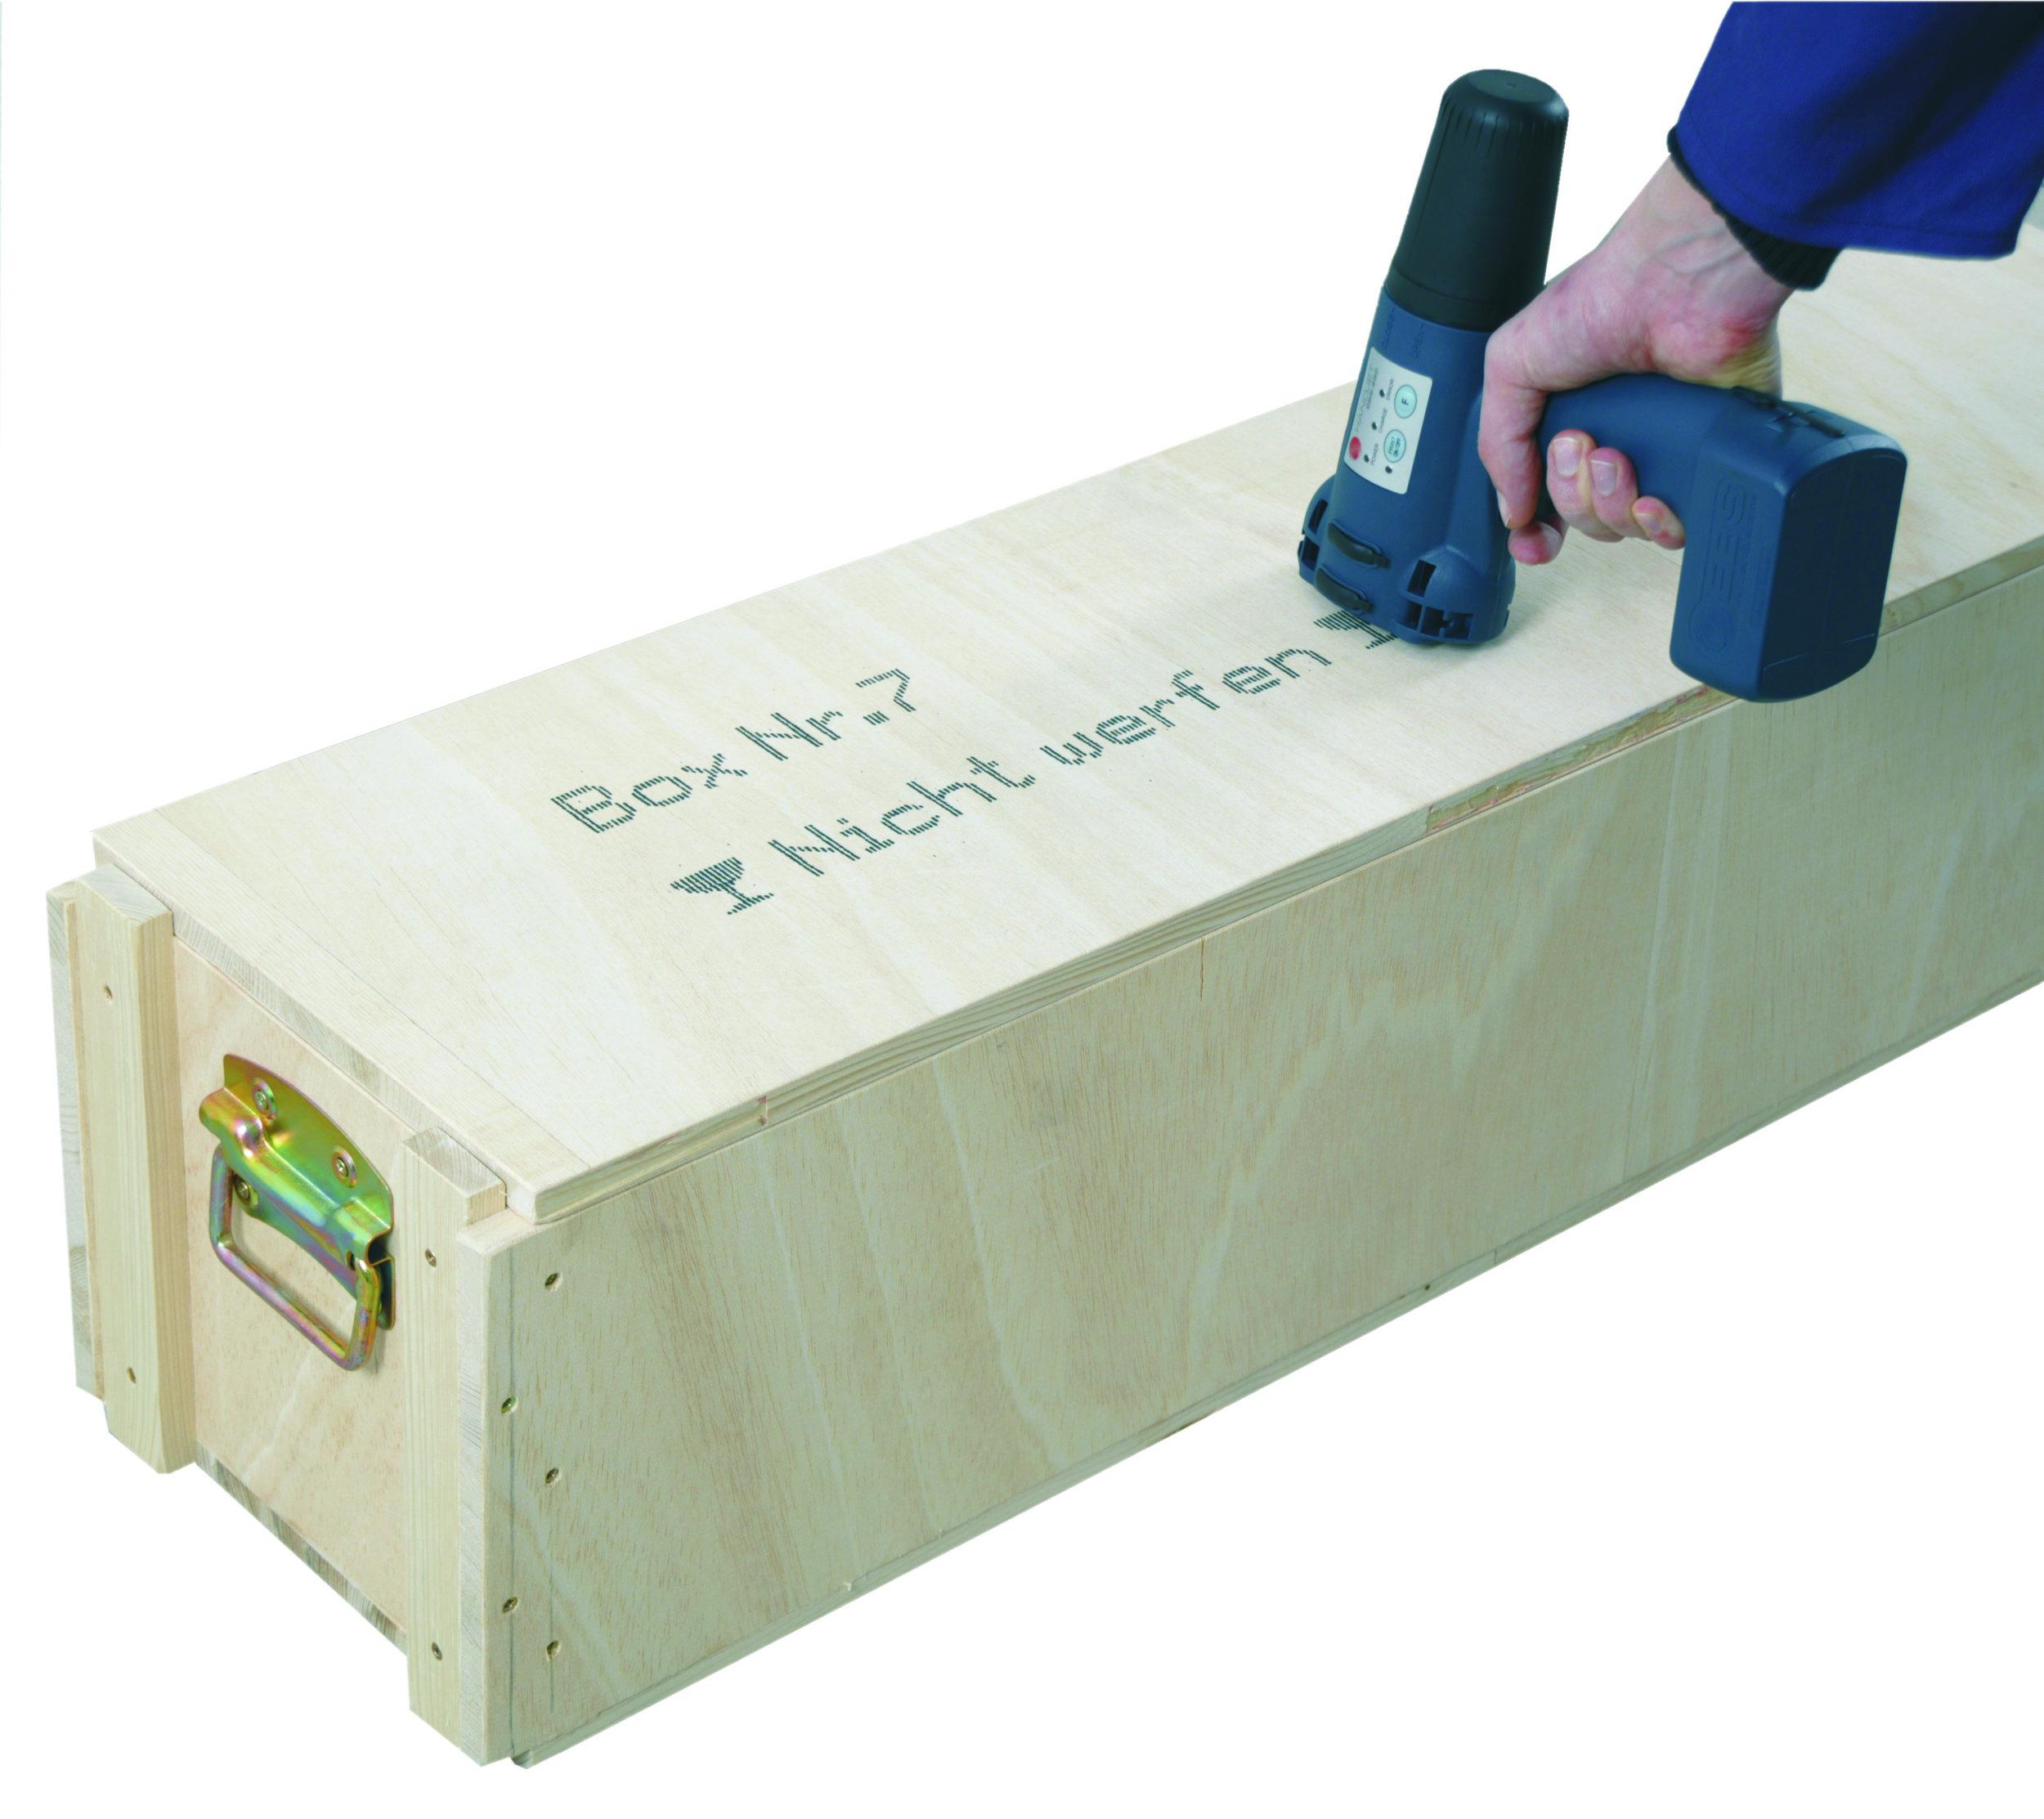 Holz Kiste.jpg